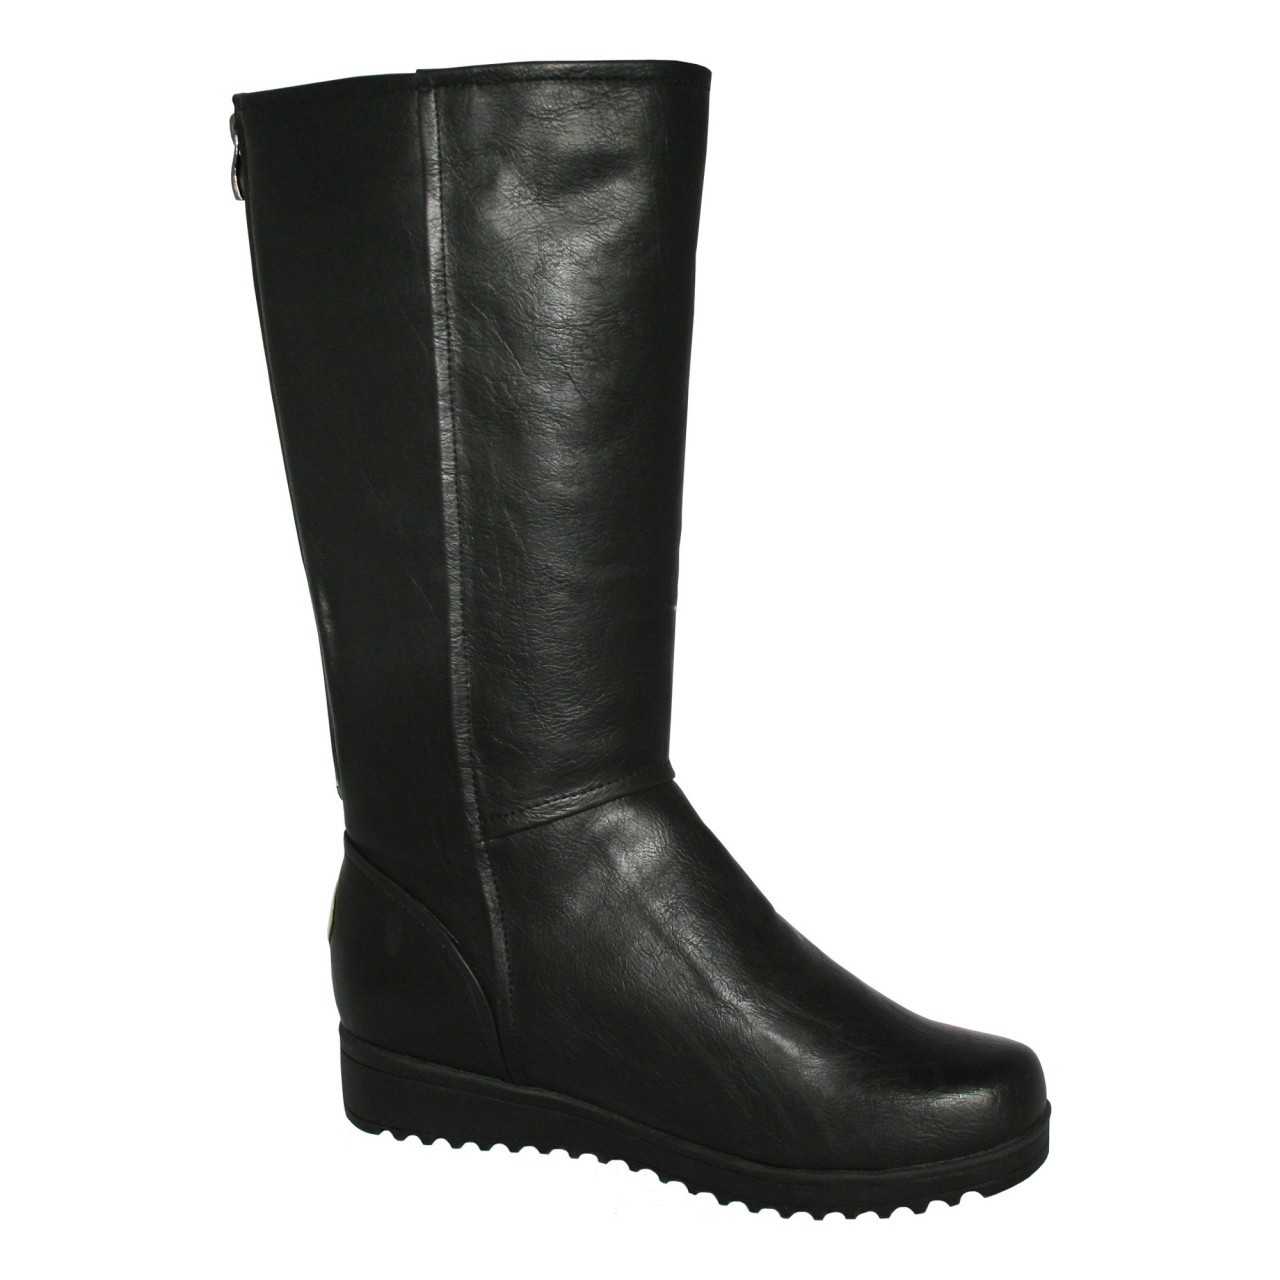 Neuaura Logan non leather winter boots, $99